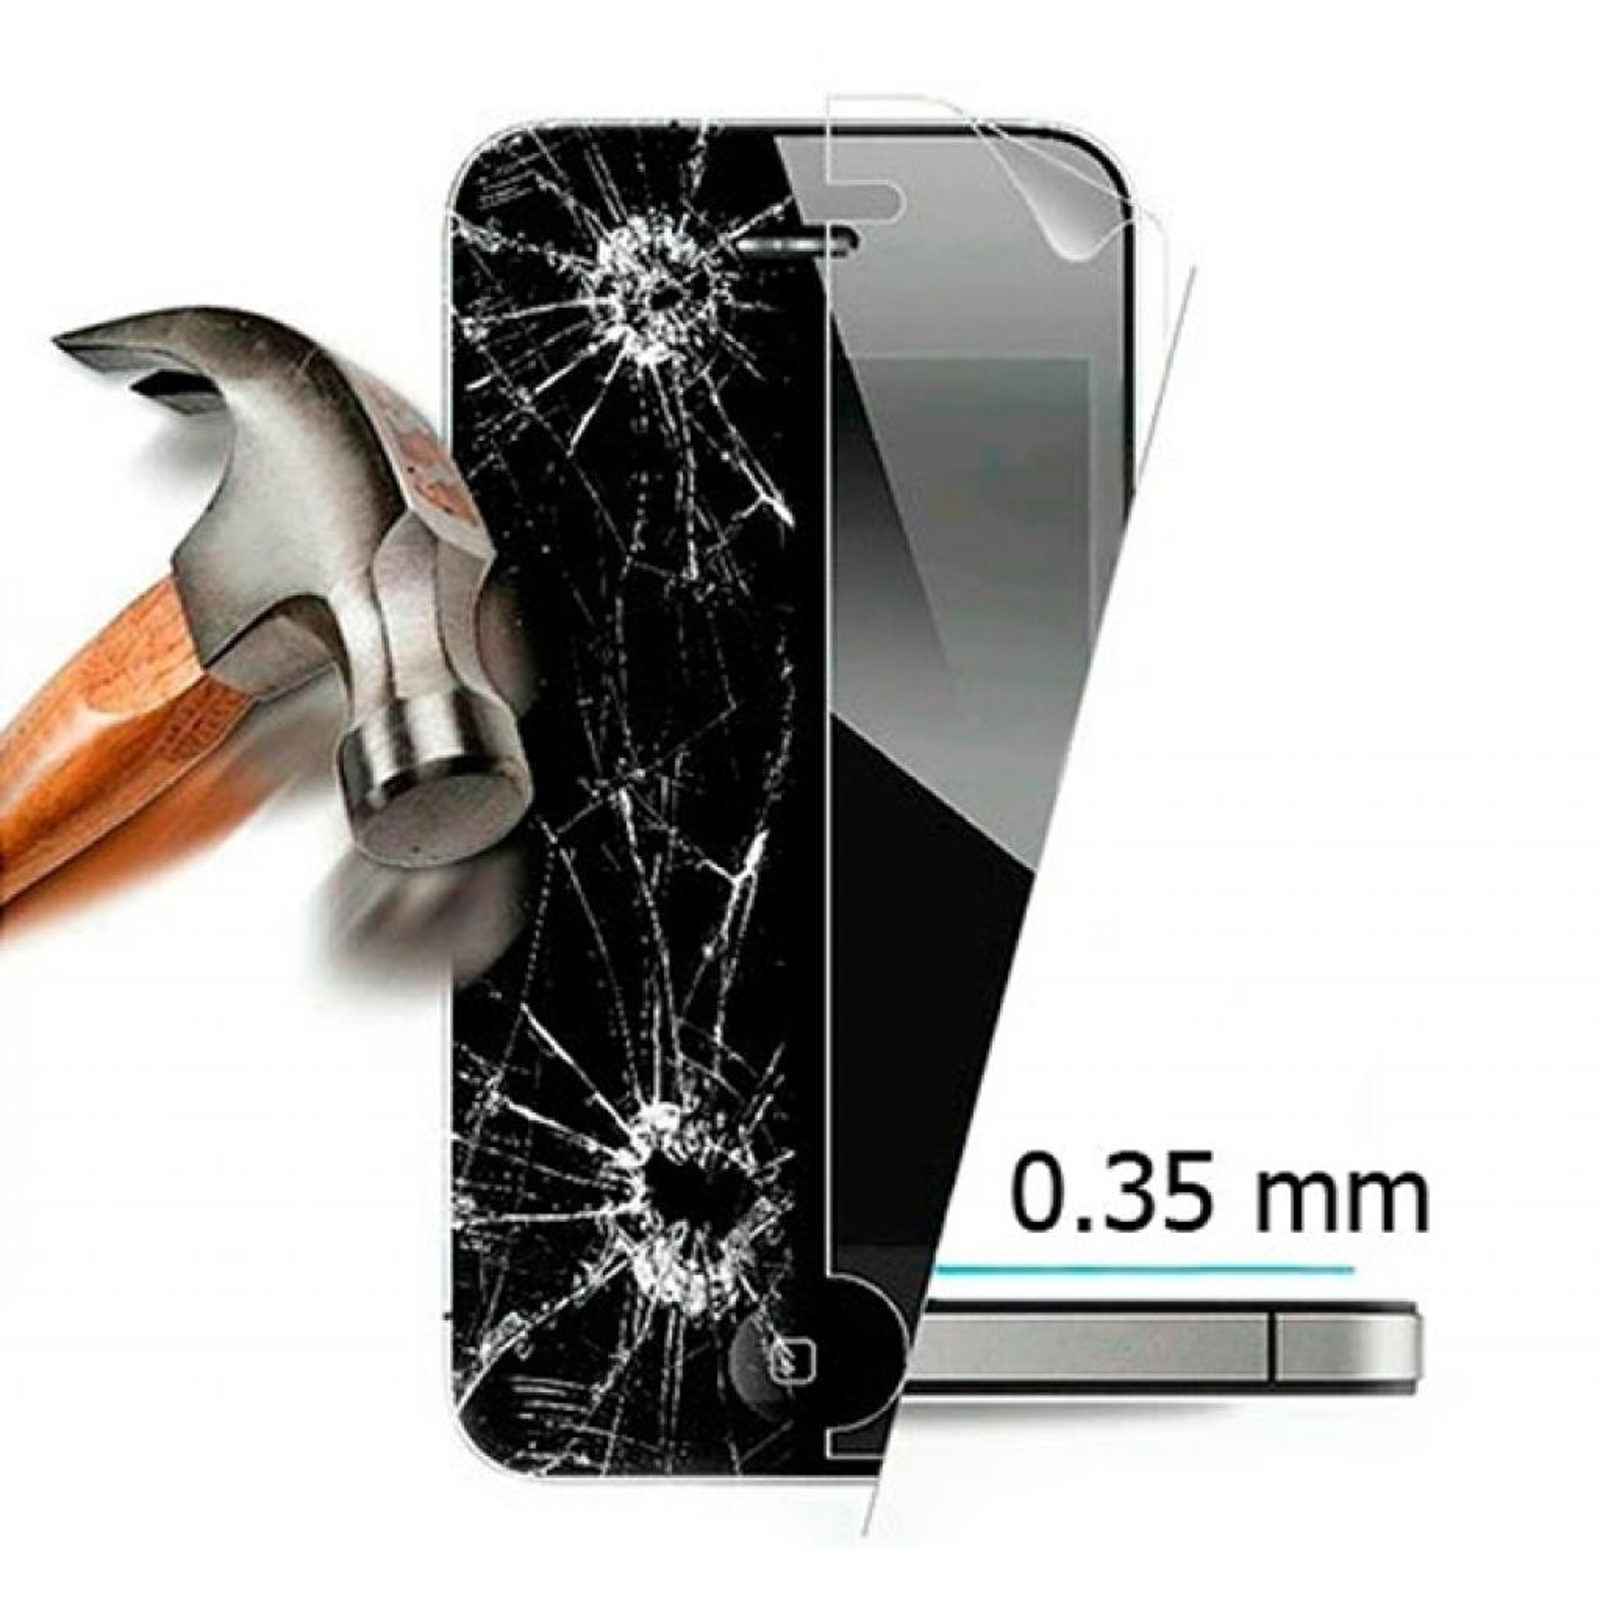 Пленка защитная Drobak для планшета Apple iPad mini Anti-Shock (500233) изображение 2